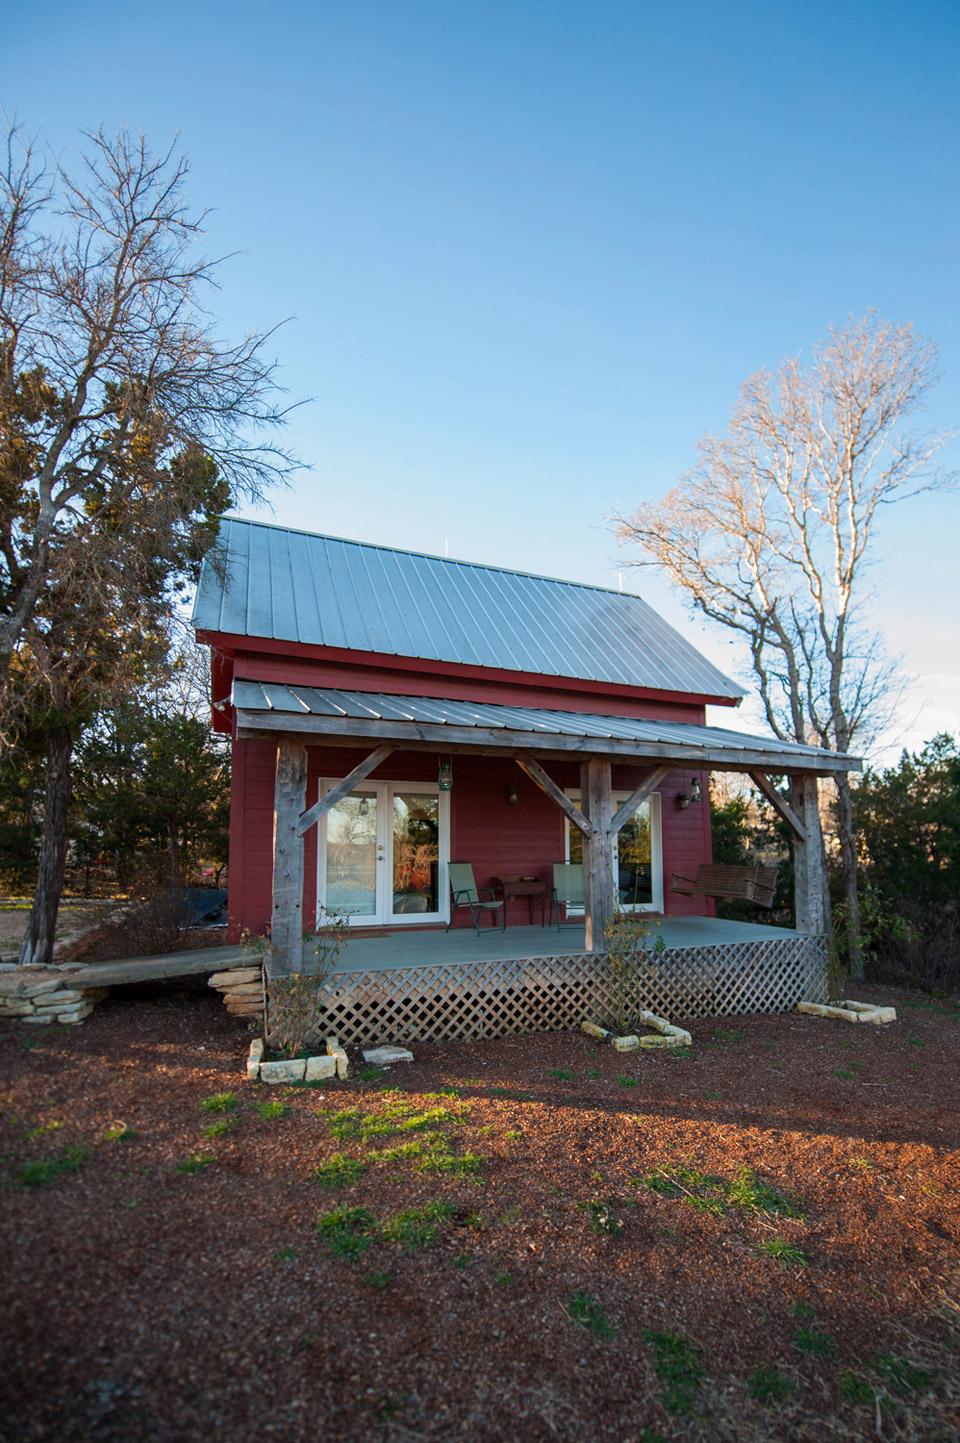 Lloyd S Blog Restored Small Home In Waco Texas